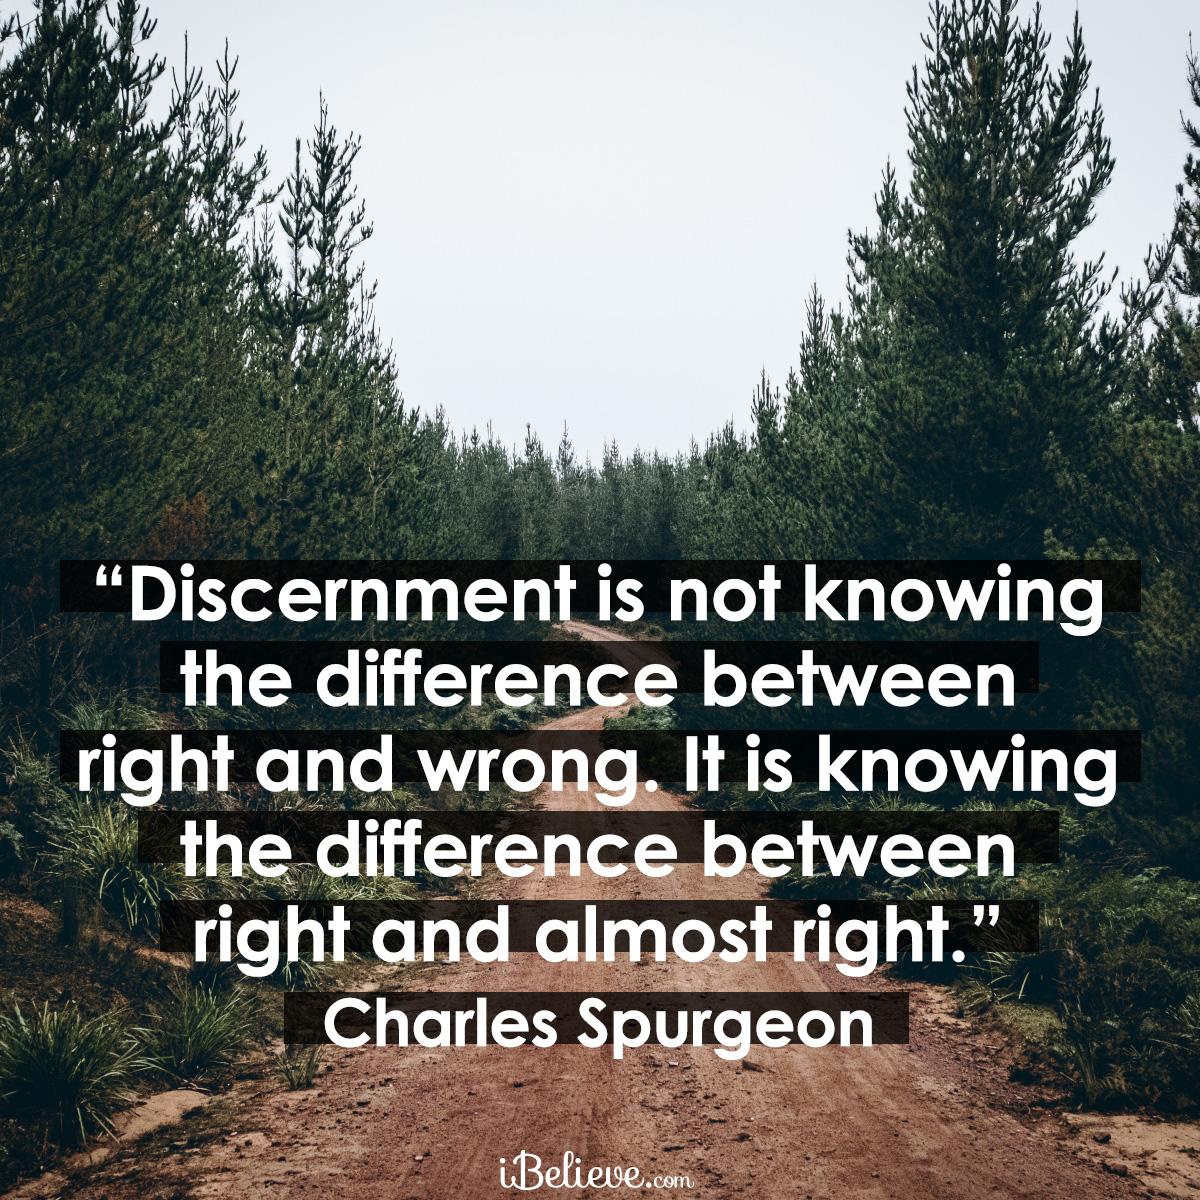 discernment-sw